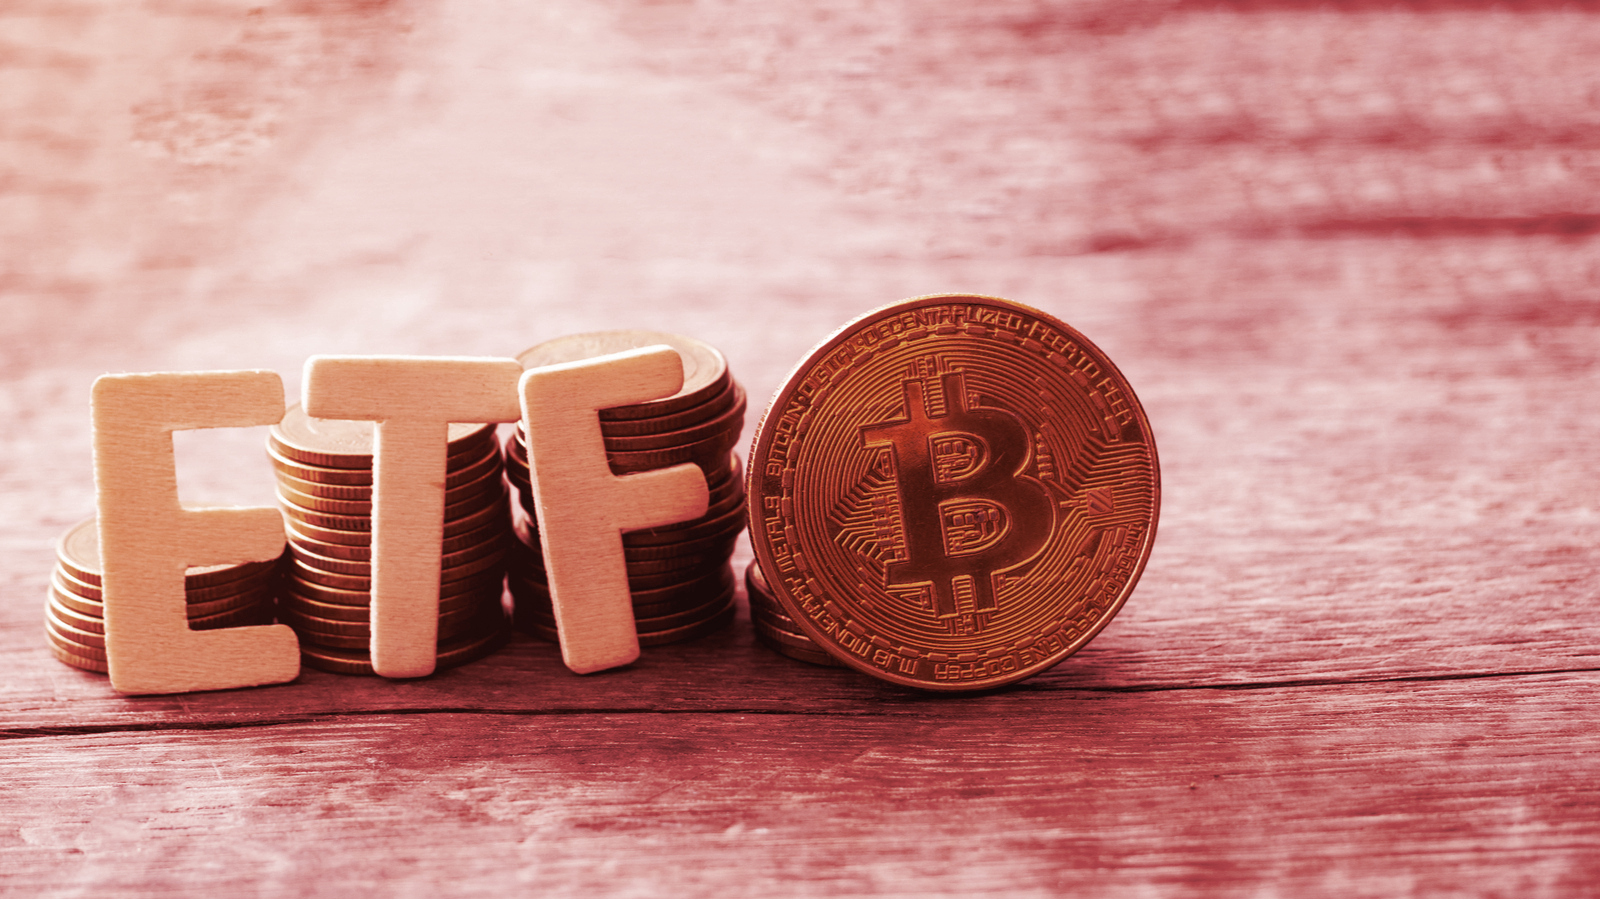 The World's First Bitcoin ETF Now Holds 10,000 BTC - Decrypt